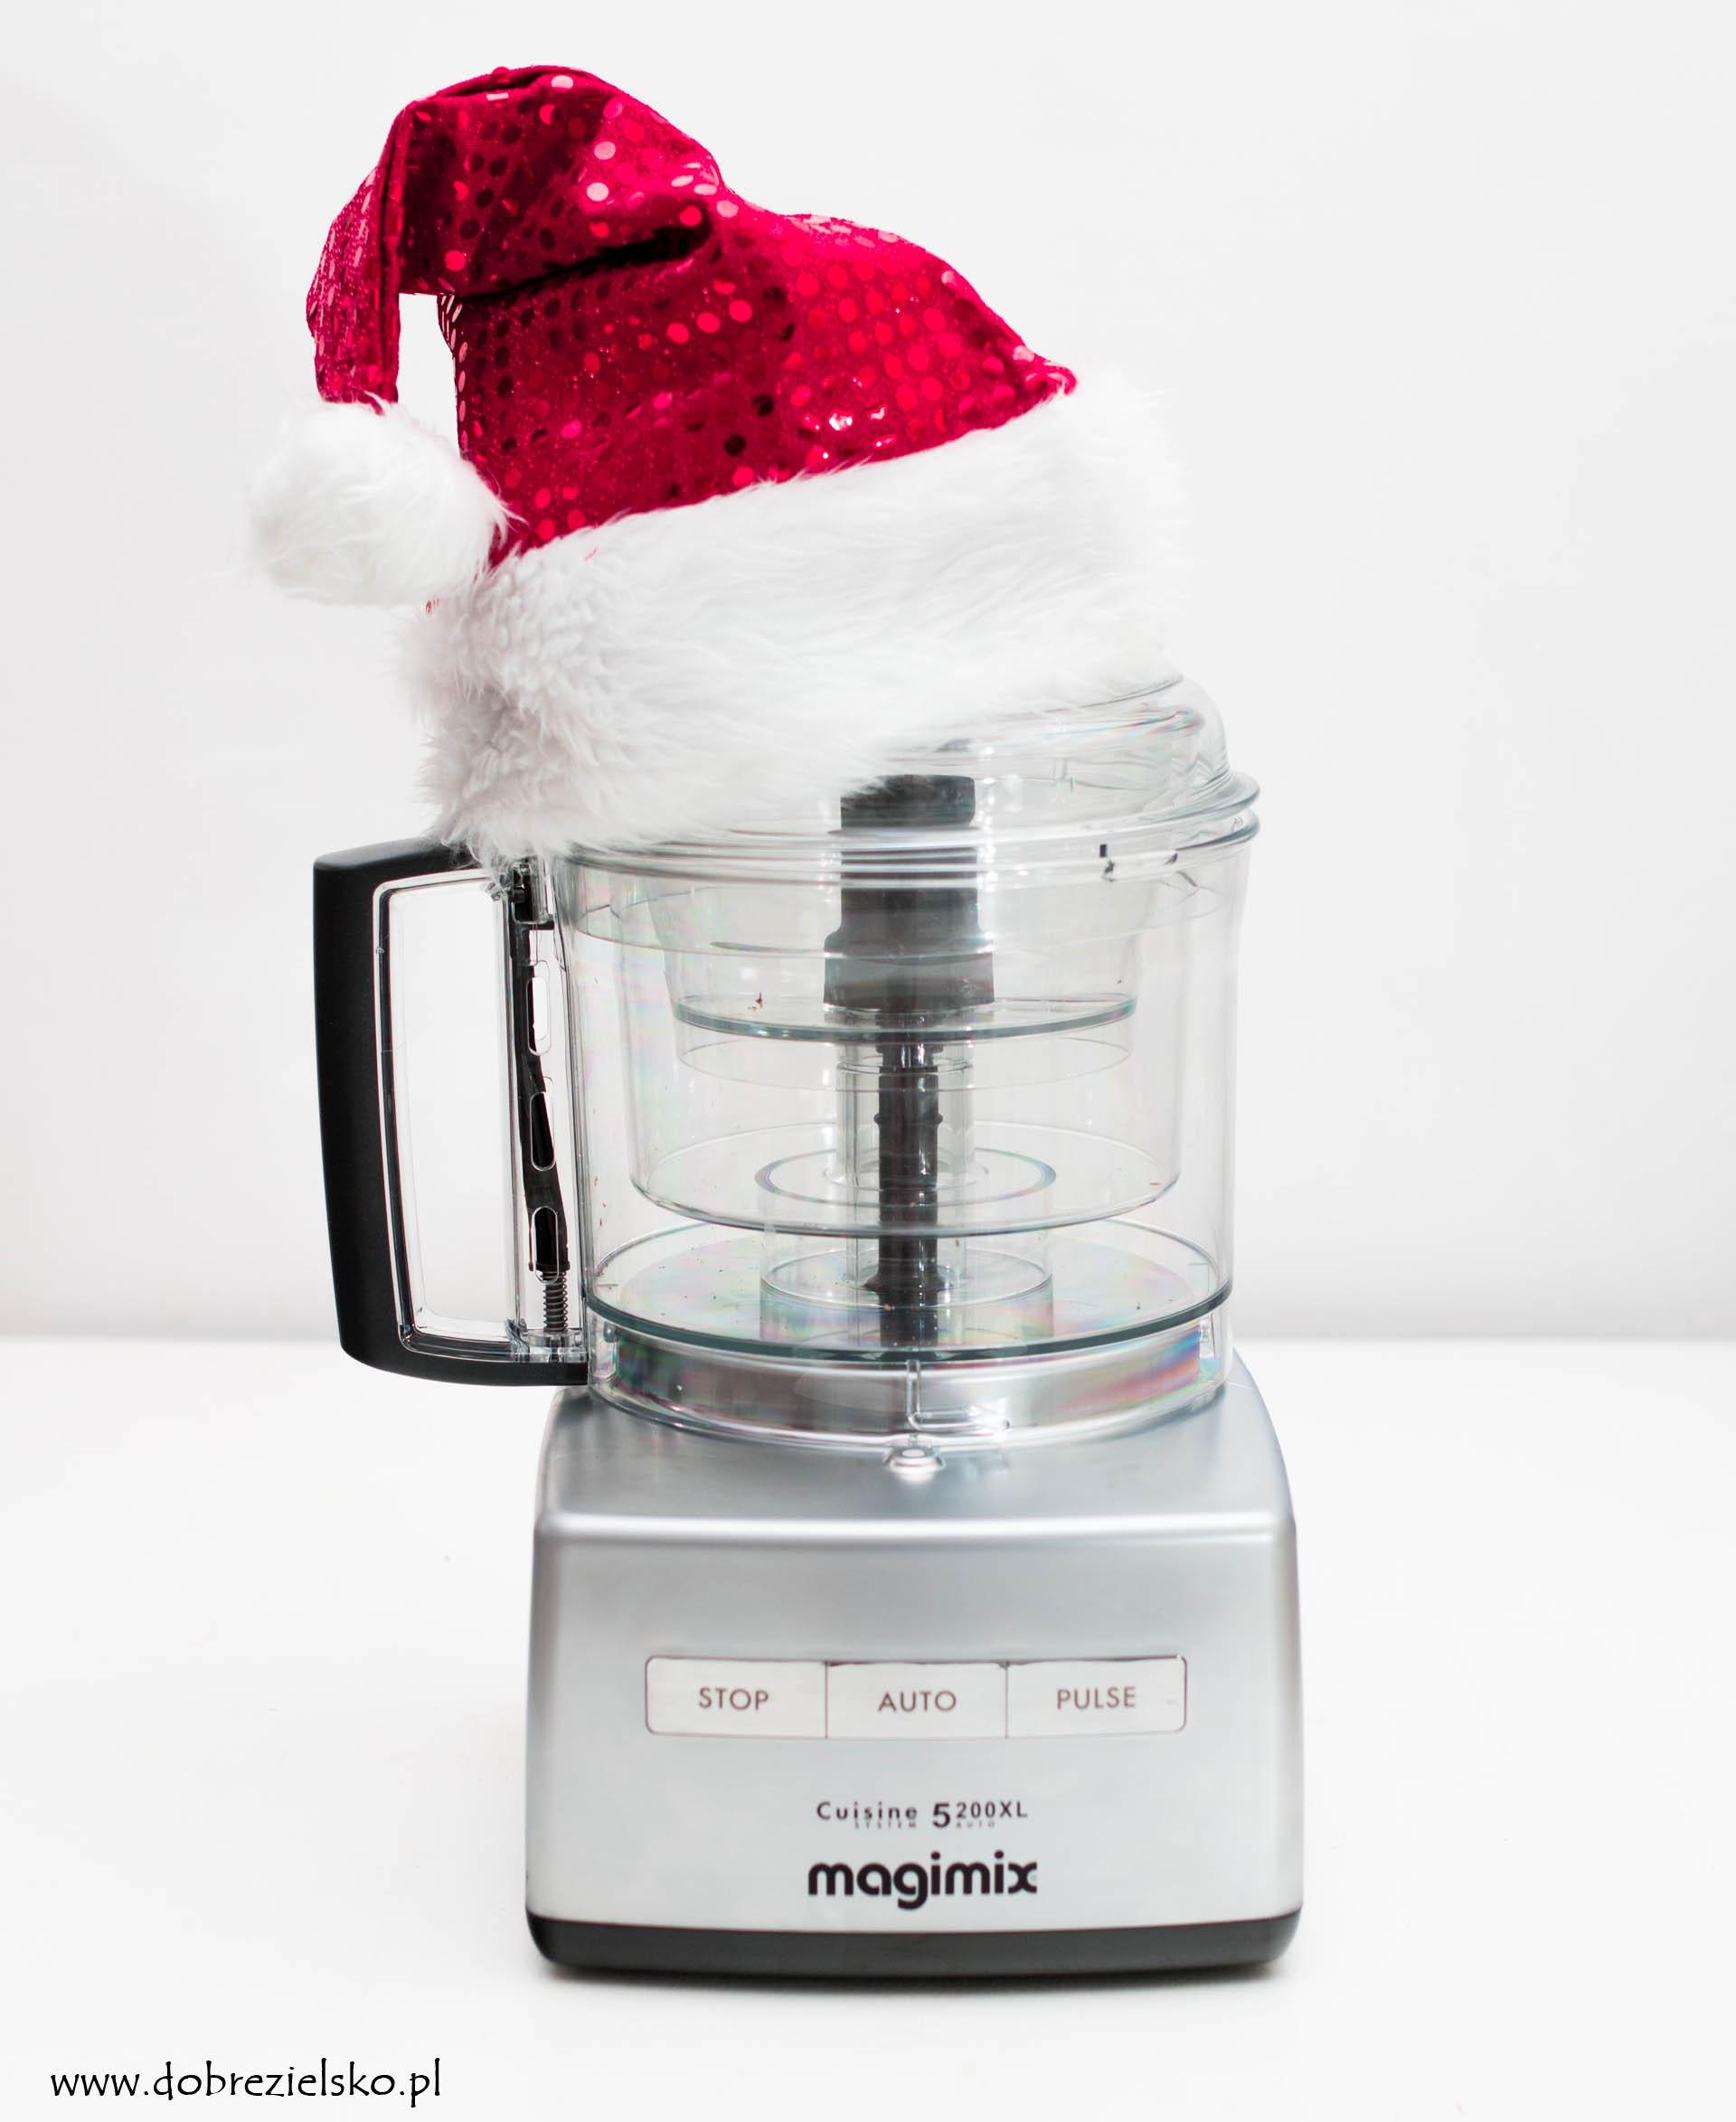 Robot kuchenny Magimix w mojej kuchni